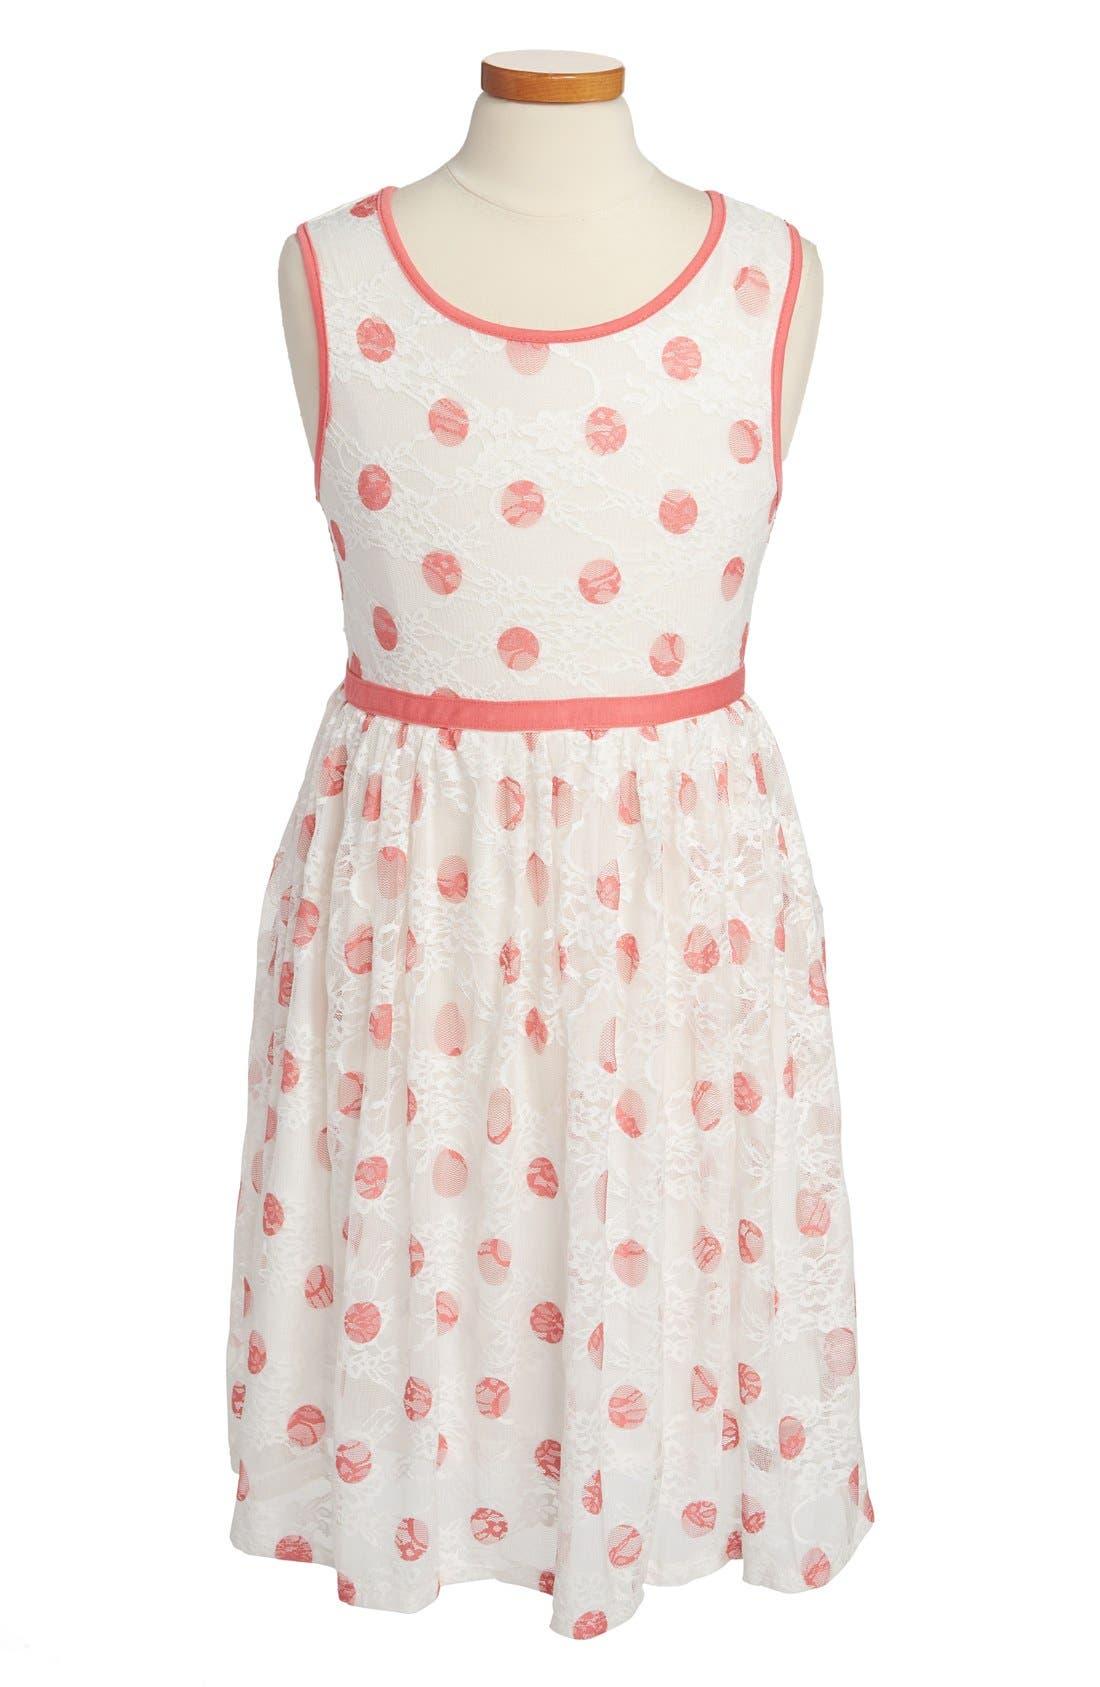 Main Image - Zunie Dot Print Lace Dress (Big Girls)